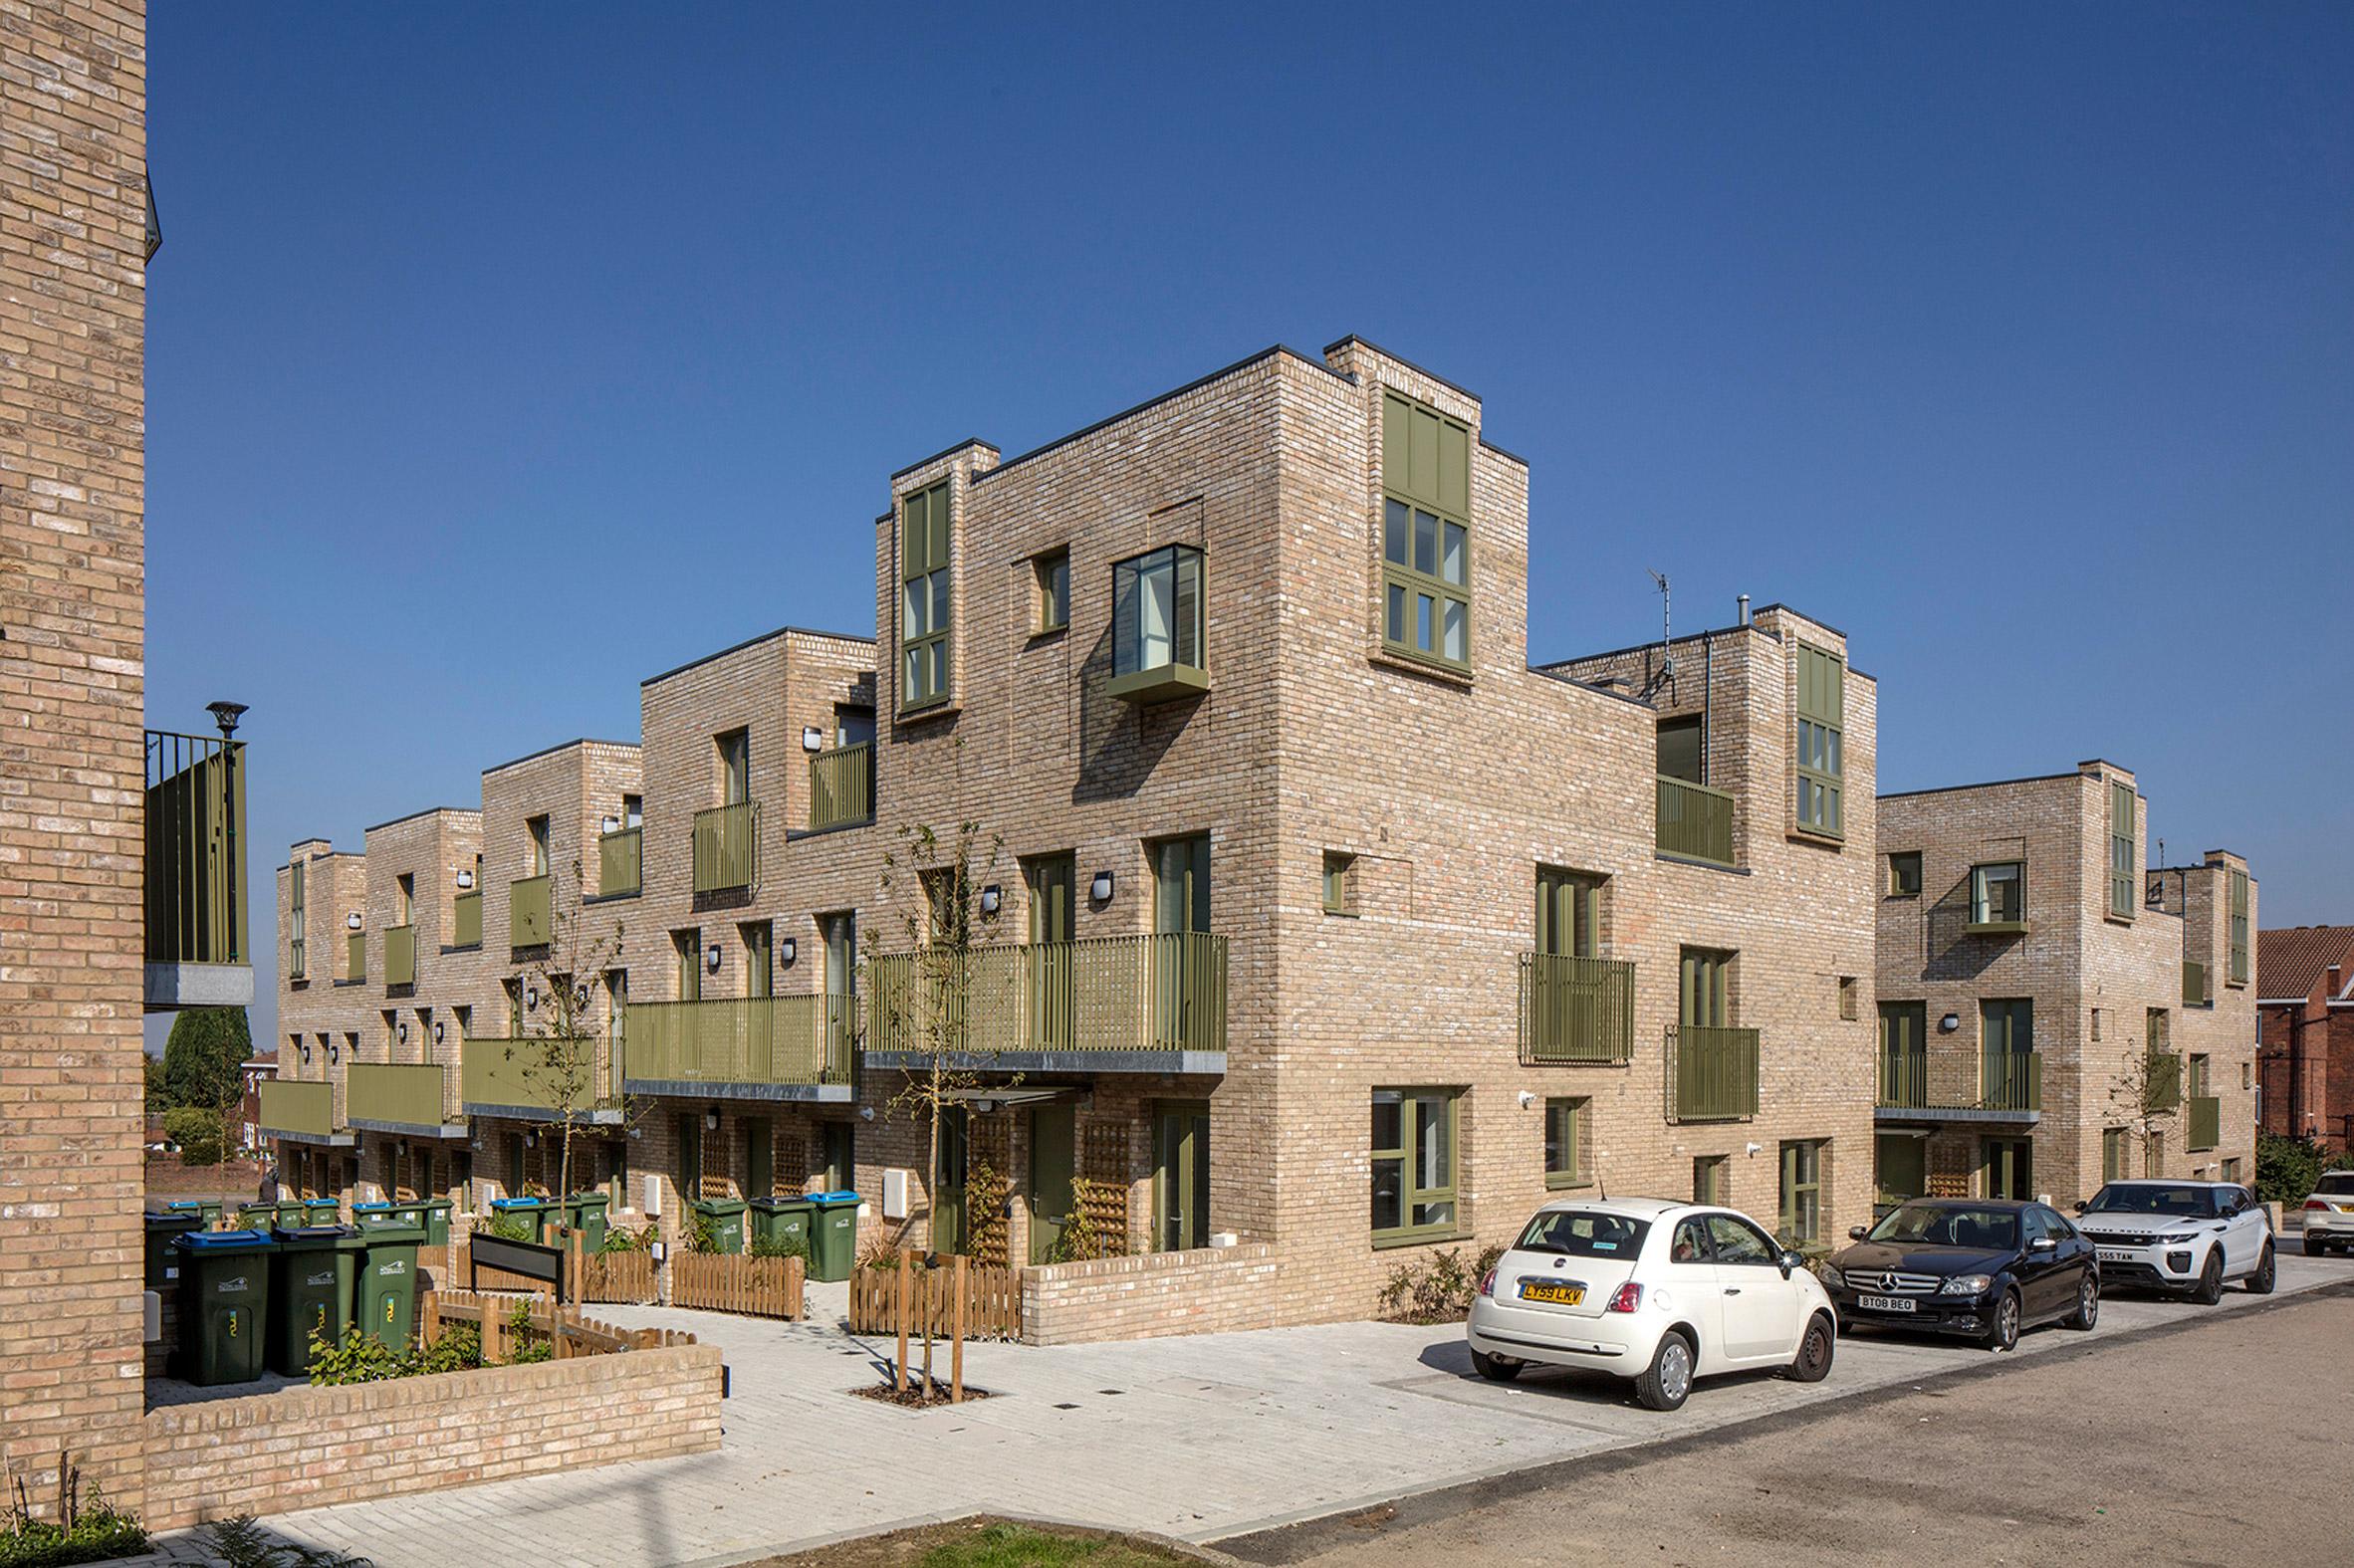 Brick housing in London